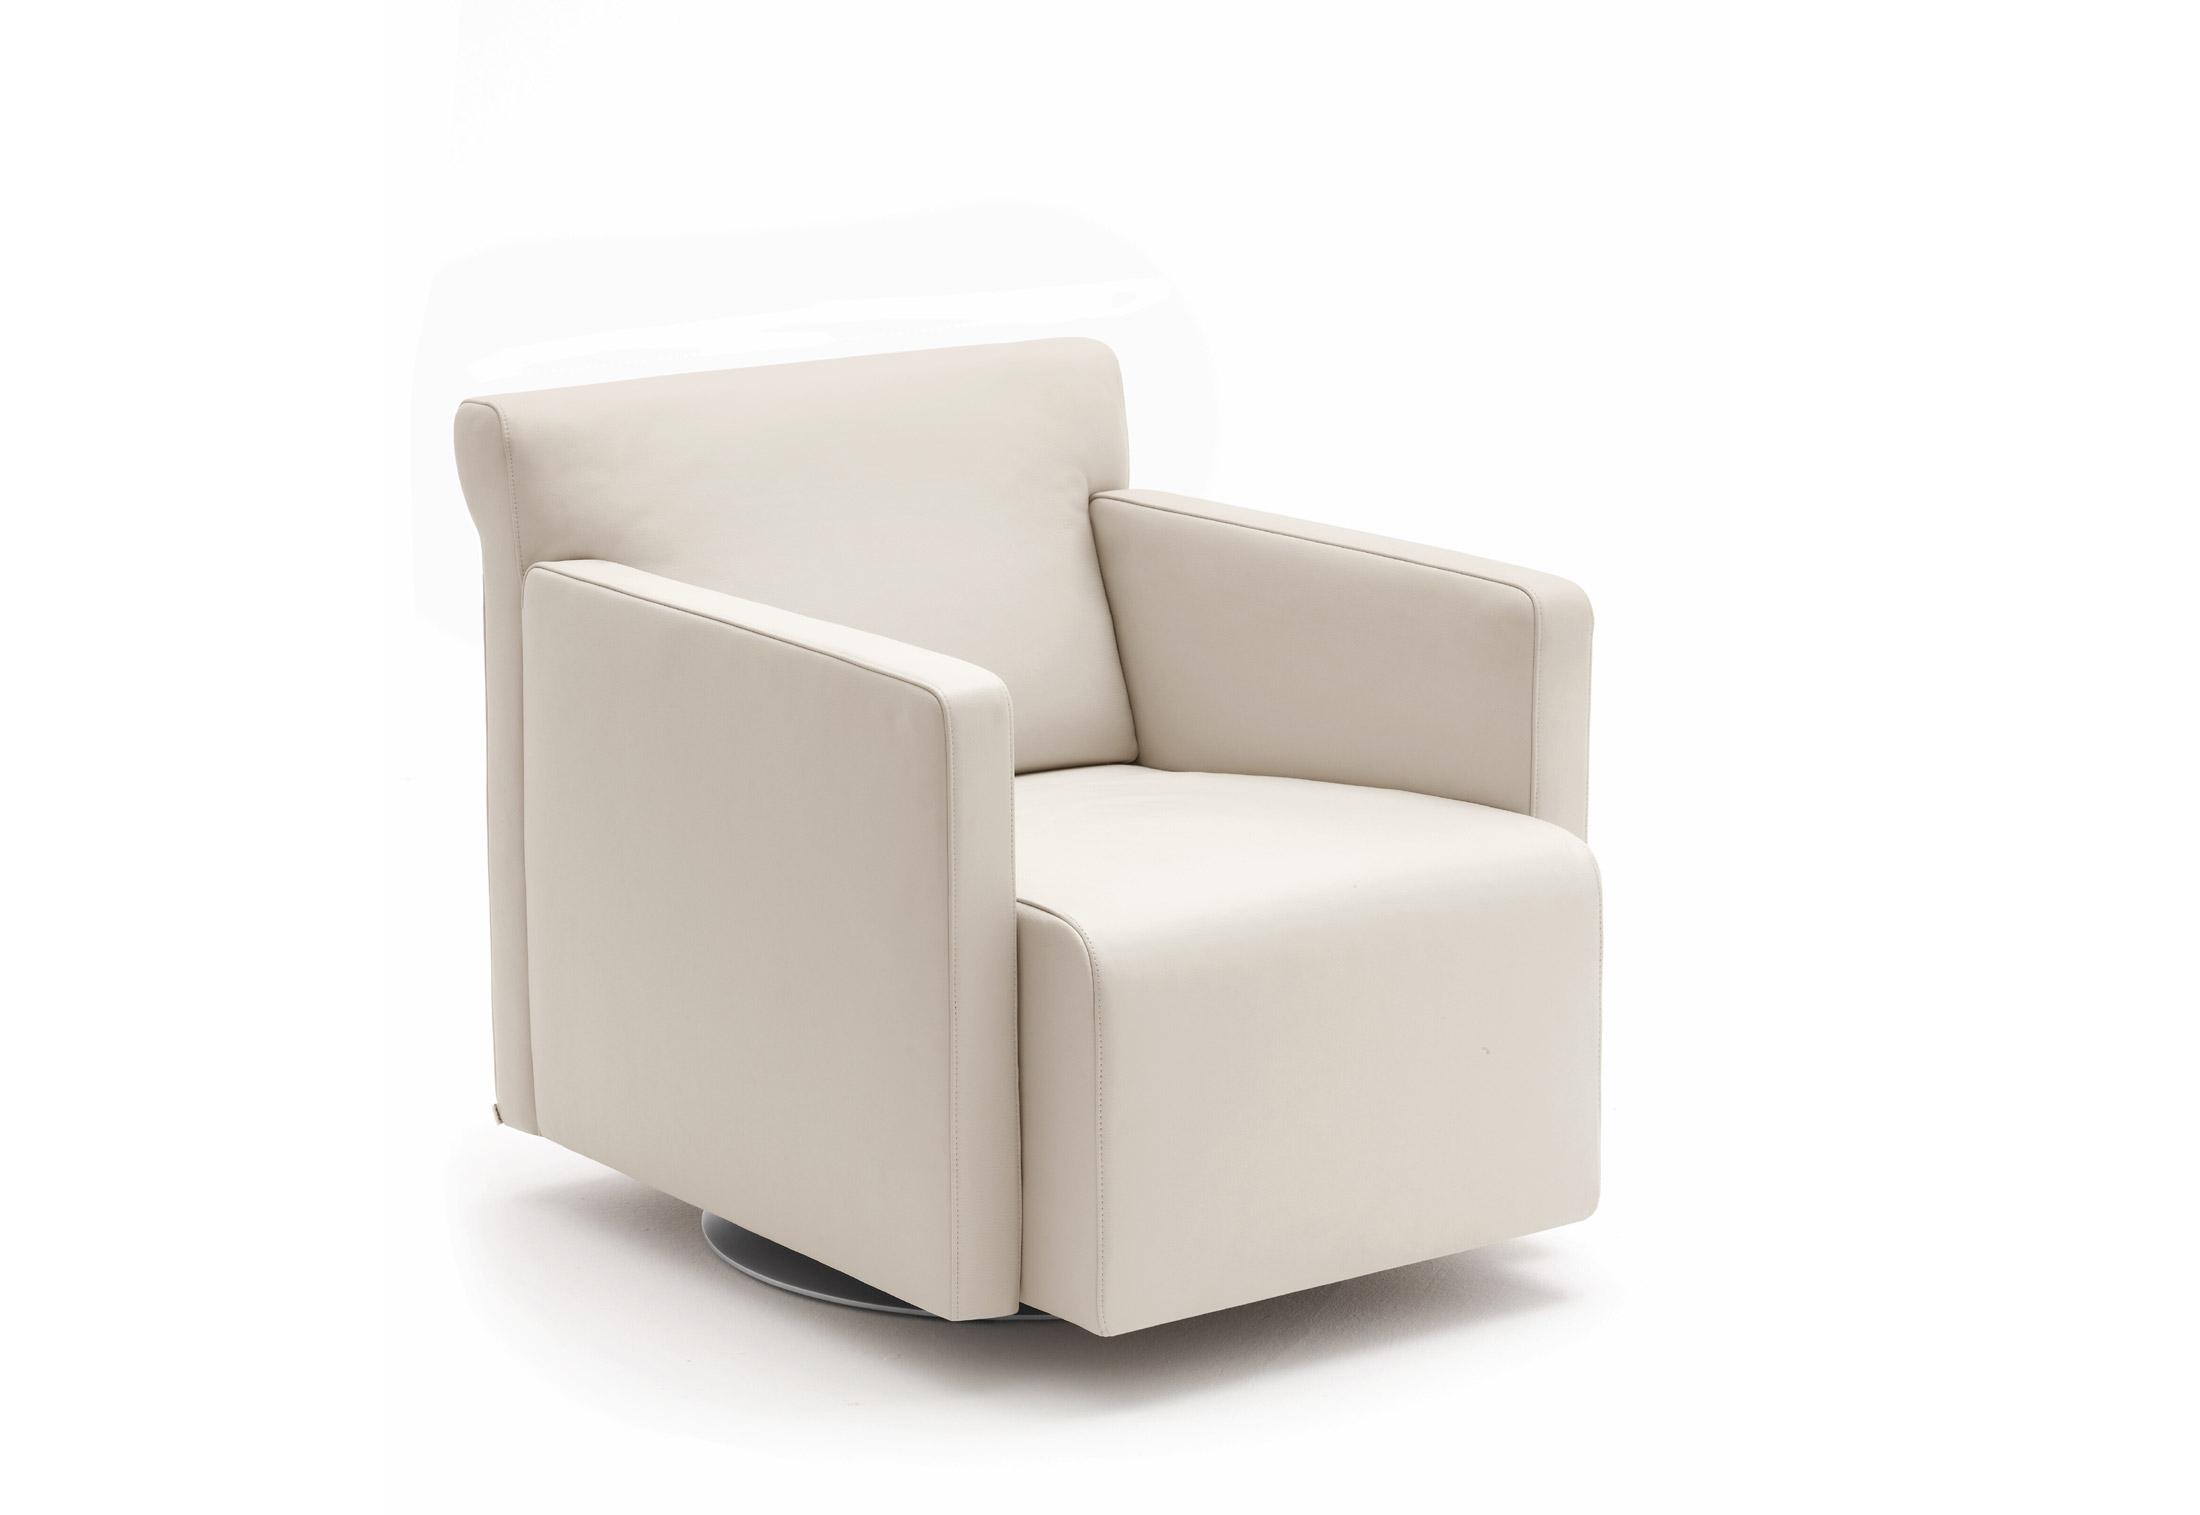 Quant lounge sessel von cor stylepark for Lounge sessel